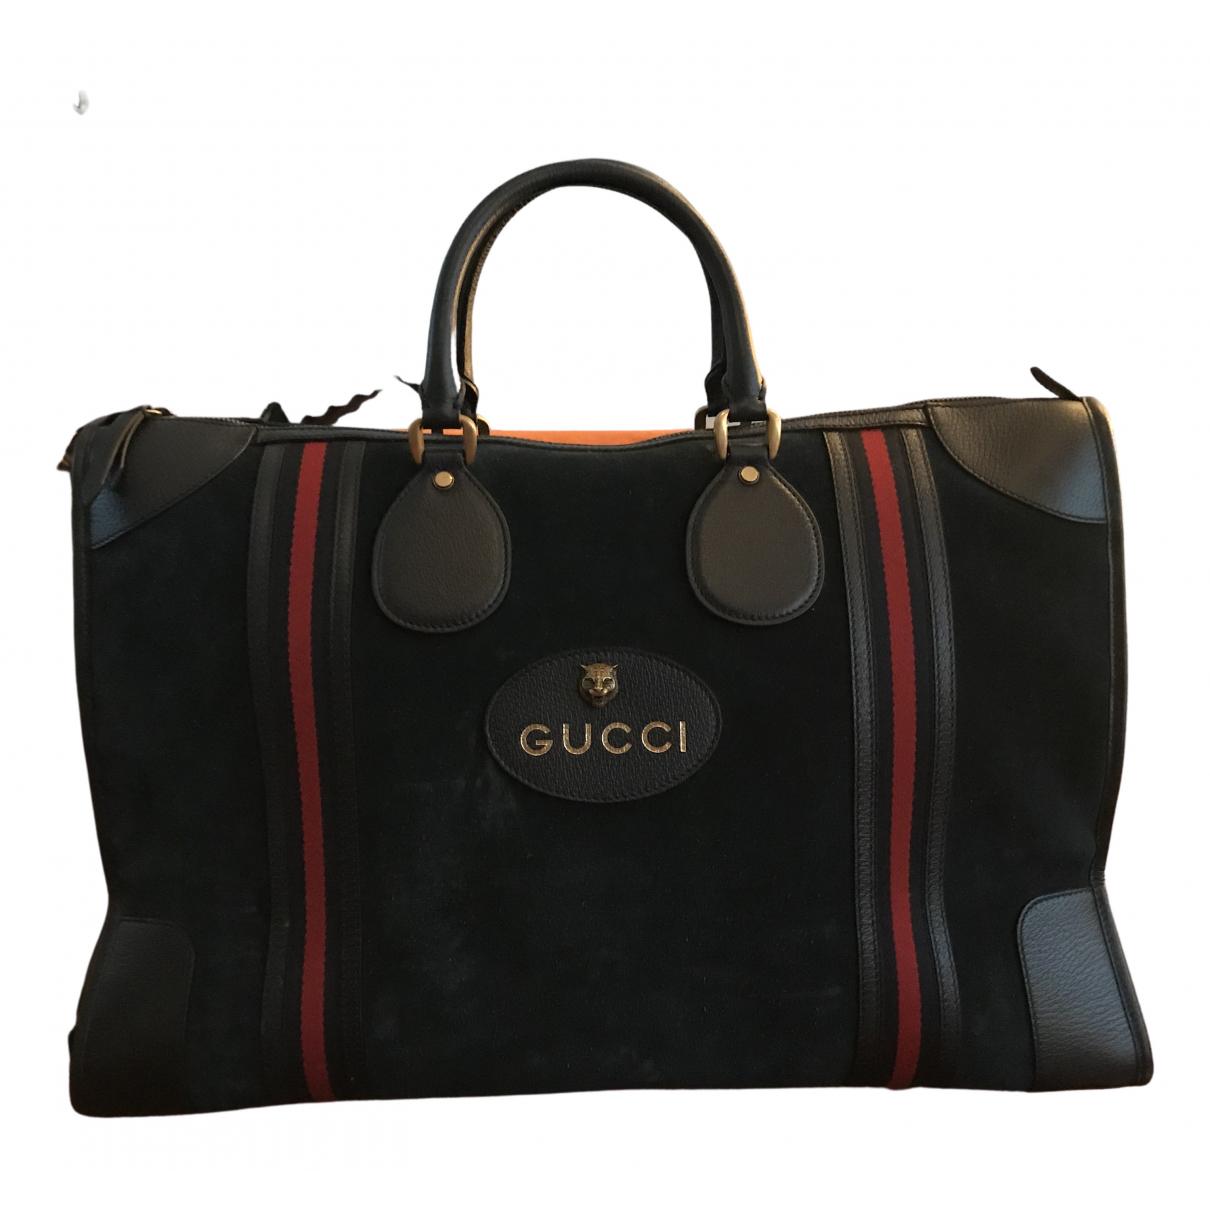 Gucci N Blue Suede Travel bag for Women N